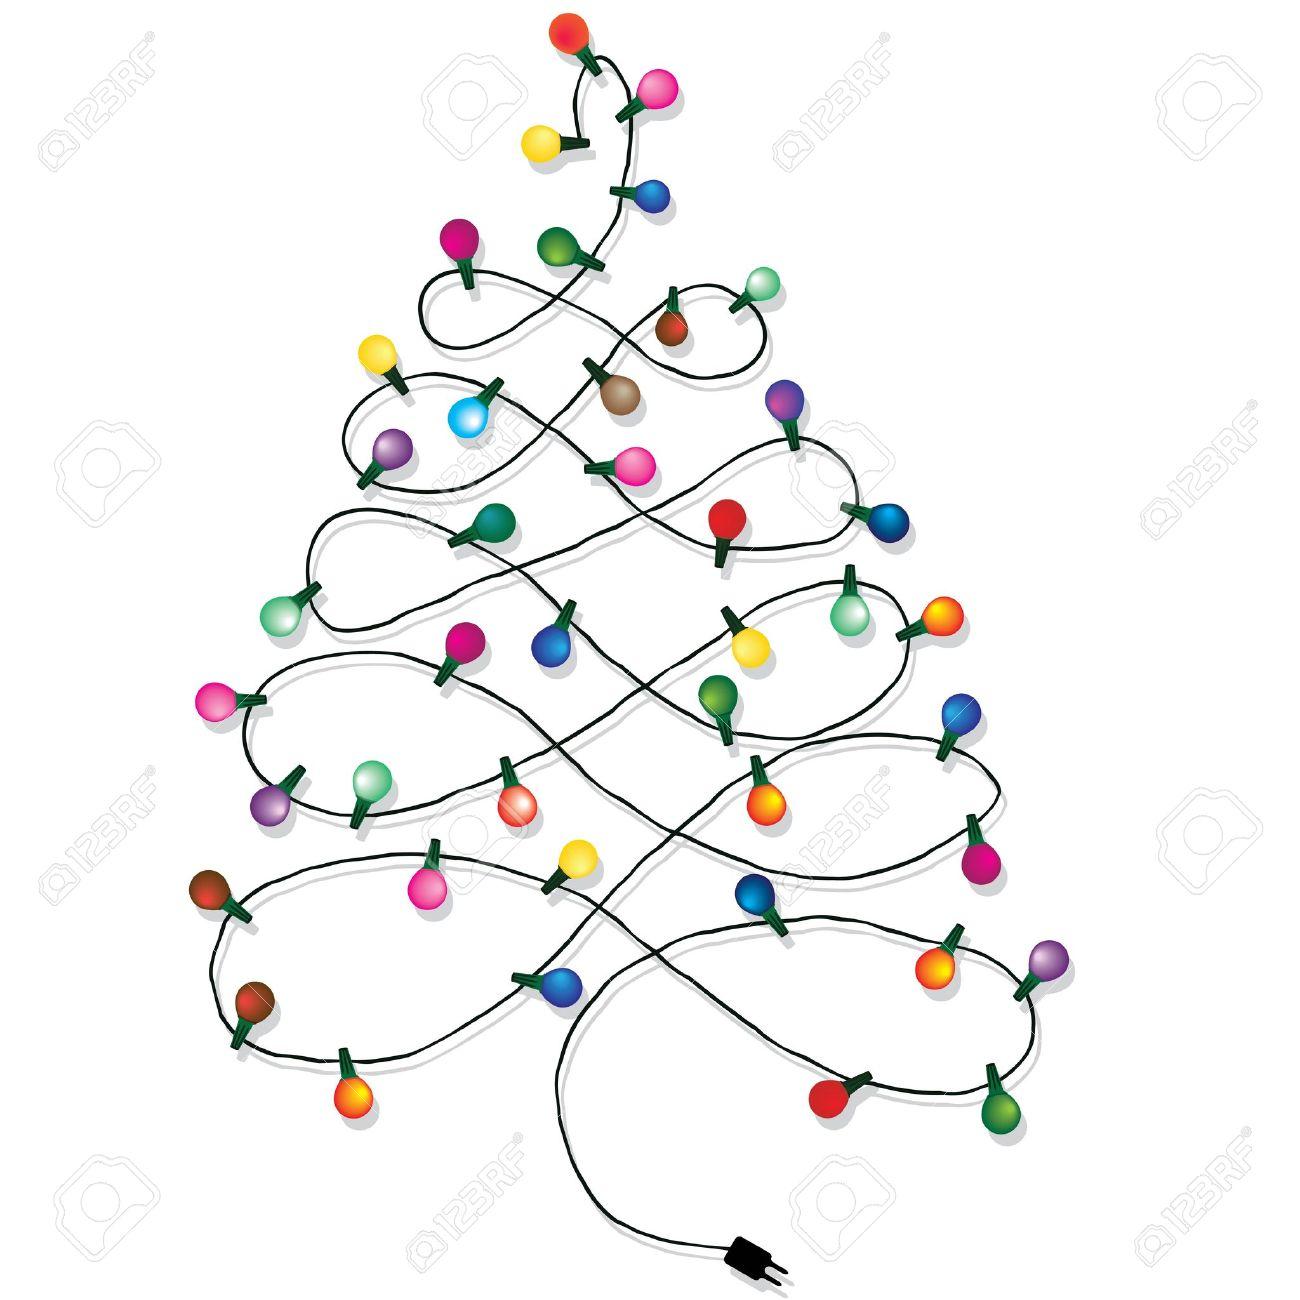 https://previews.123rf.com/images/hermione13/hermione131308/hermione13130800024/21490437-kerstboom-guirlande-verlichting-koord-van-kerstmis-achtergrond-ge%C3%AFsoleerd-op-wit.jpg